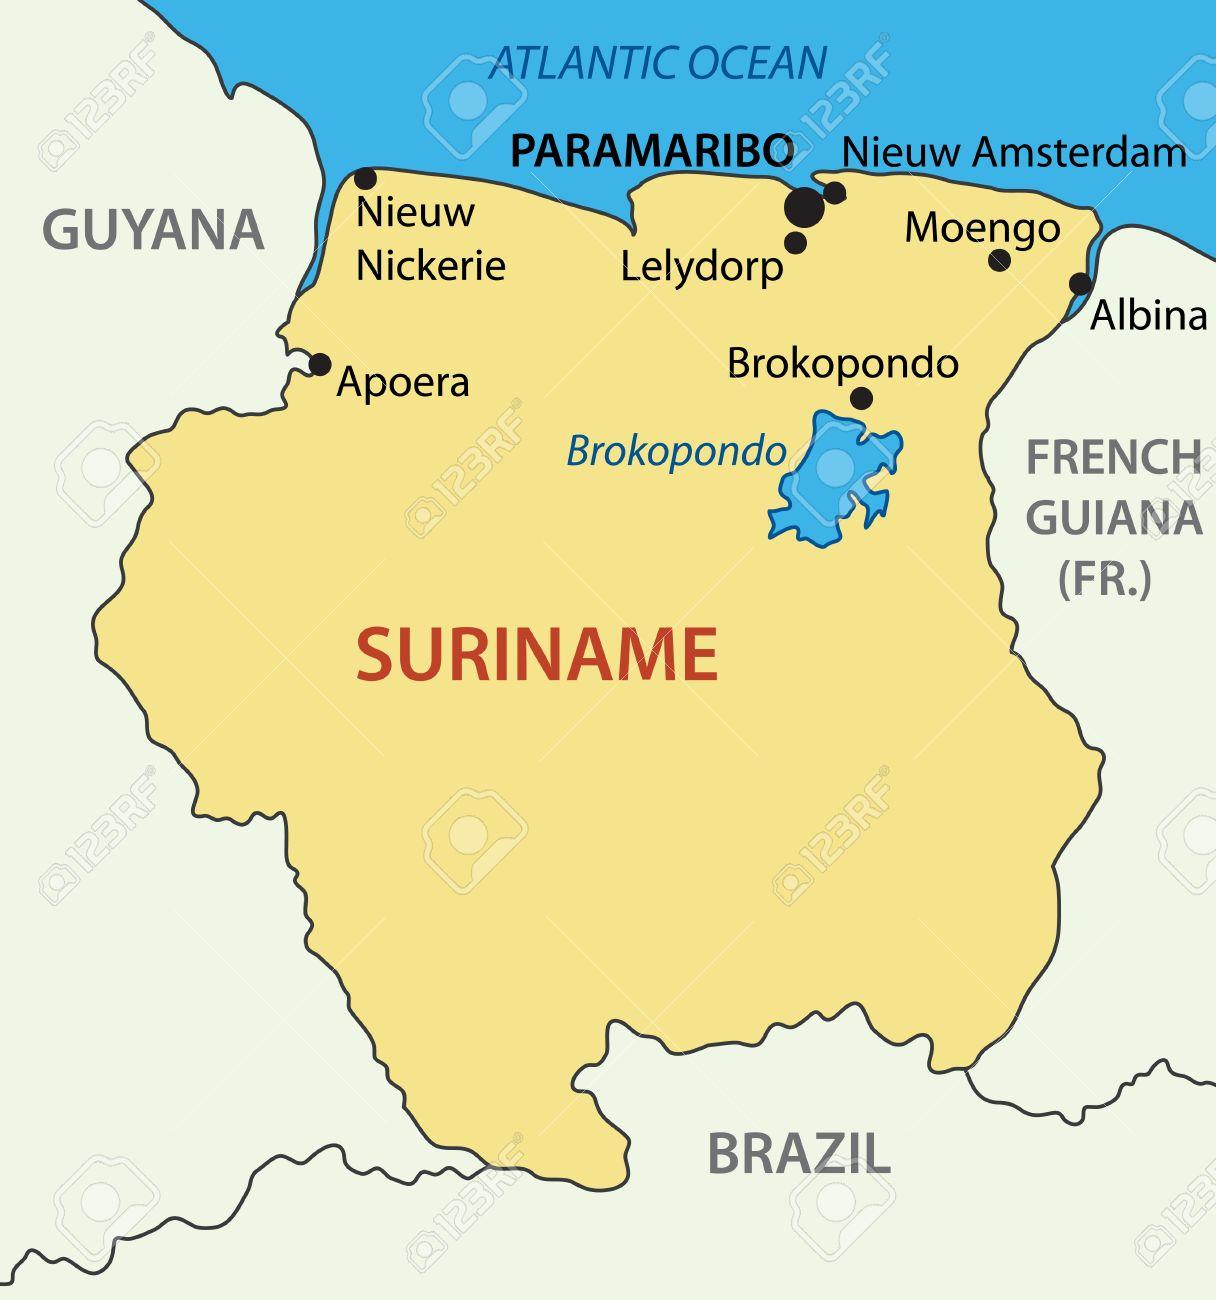 Republic Of Suriname Vector Map Royalty Free Cliparts Vectors - Suriname map